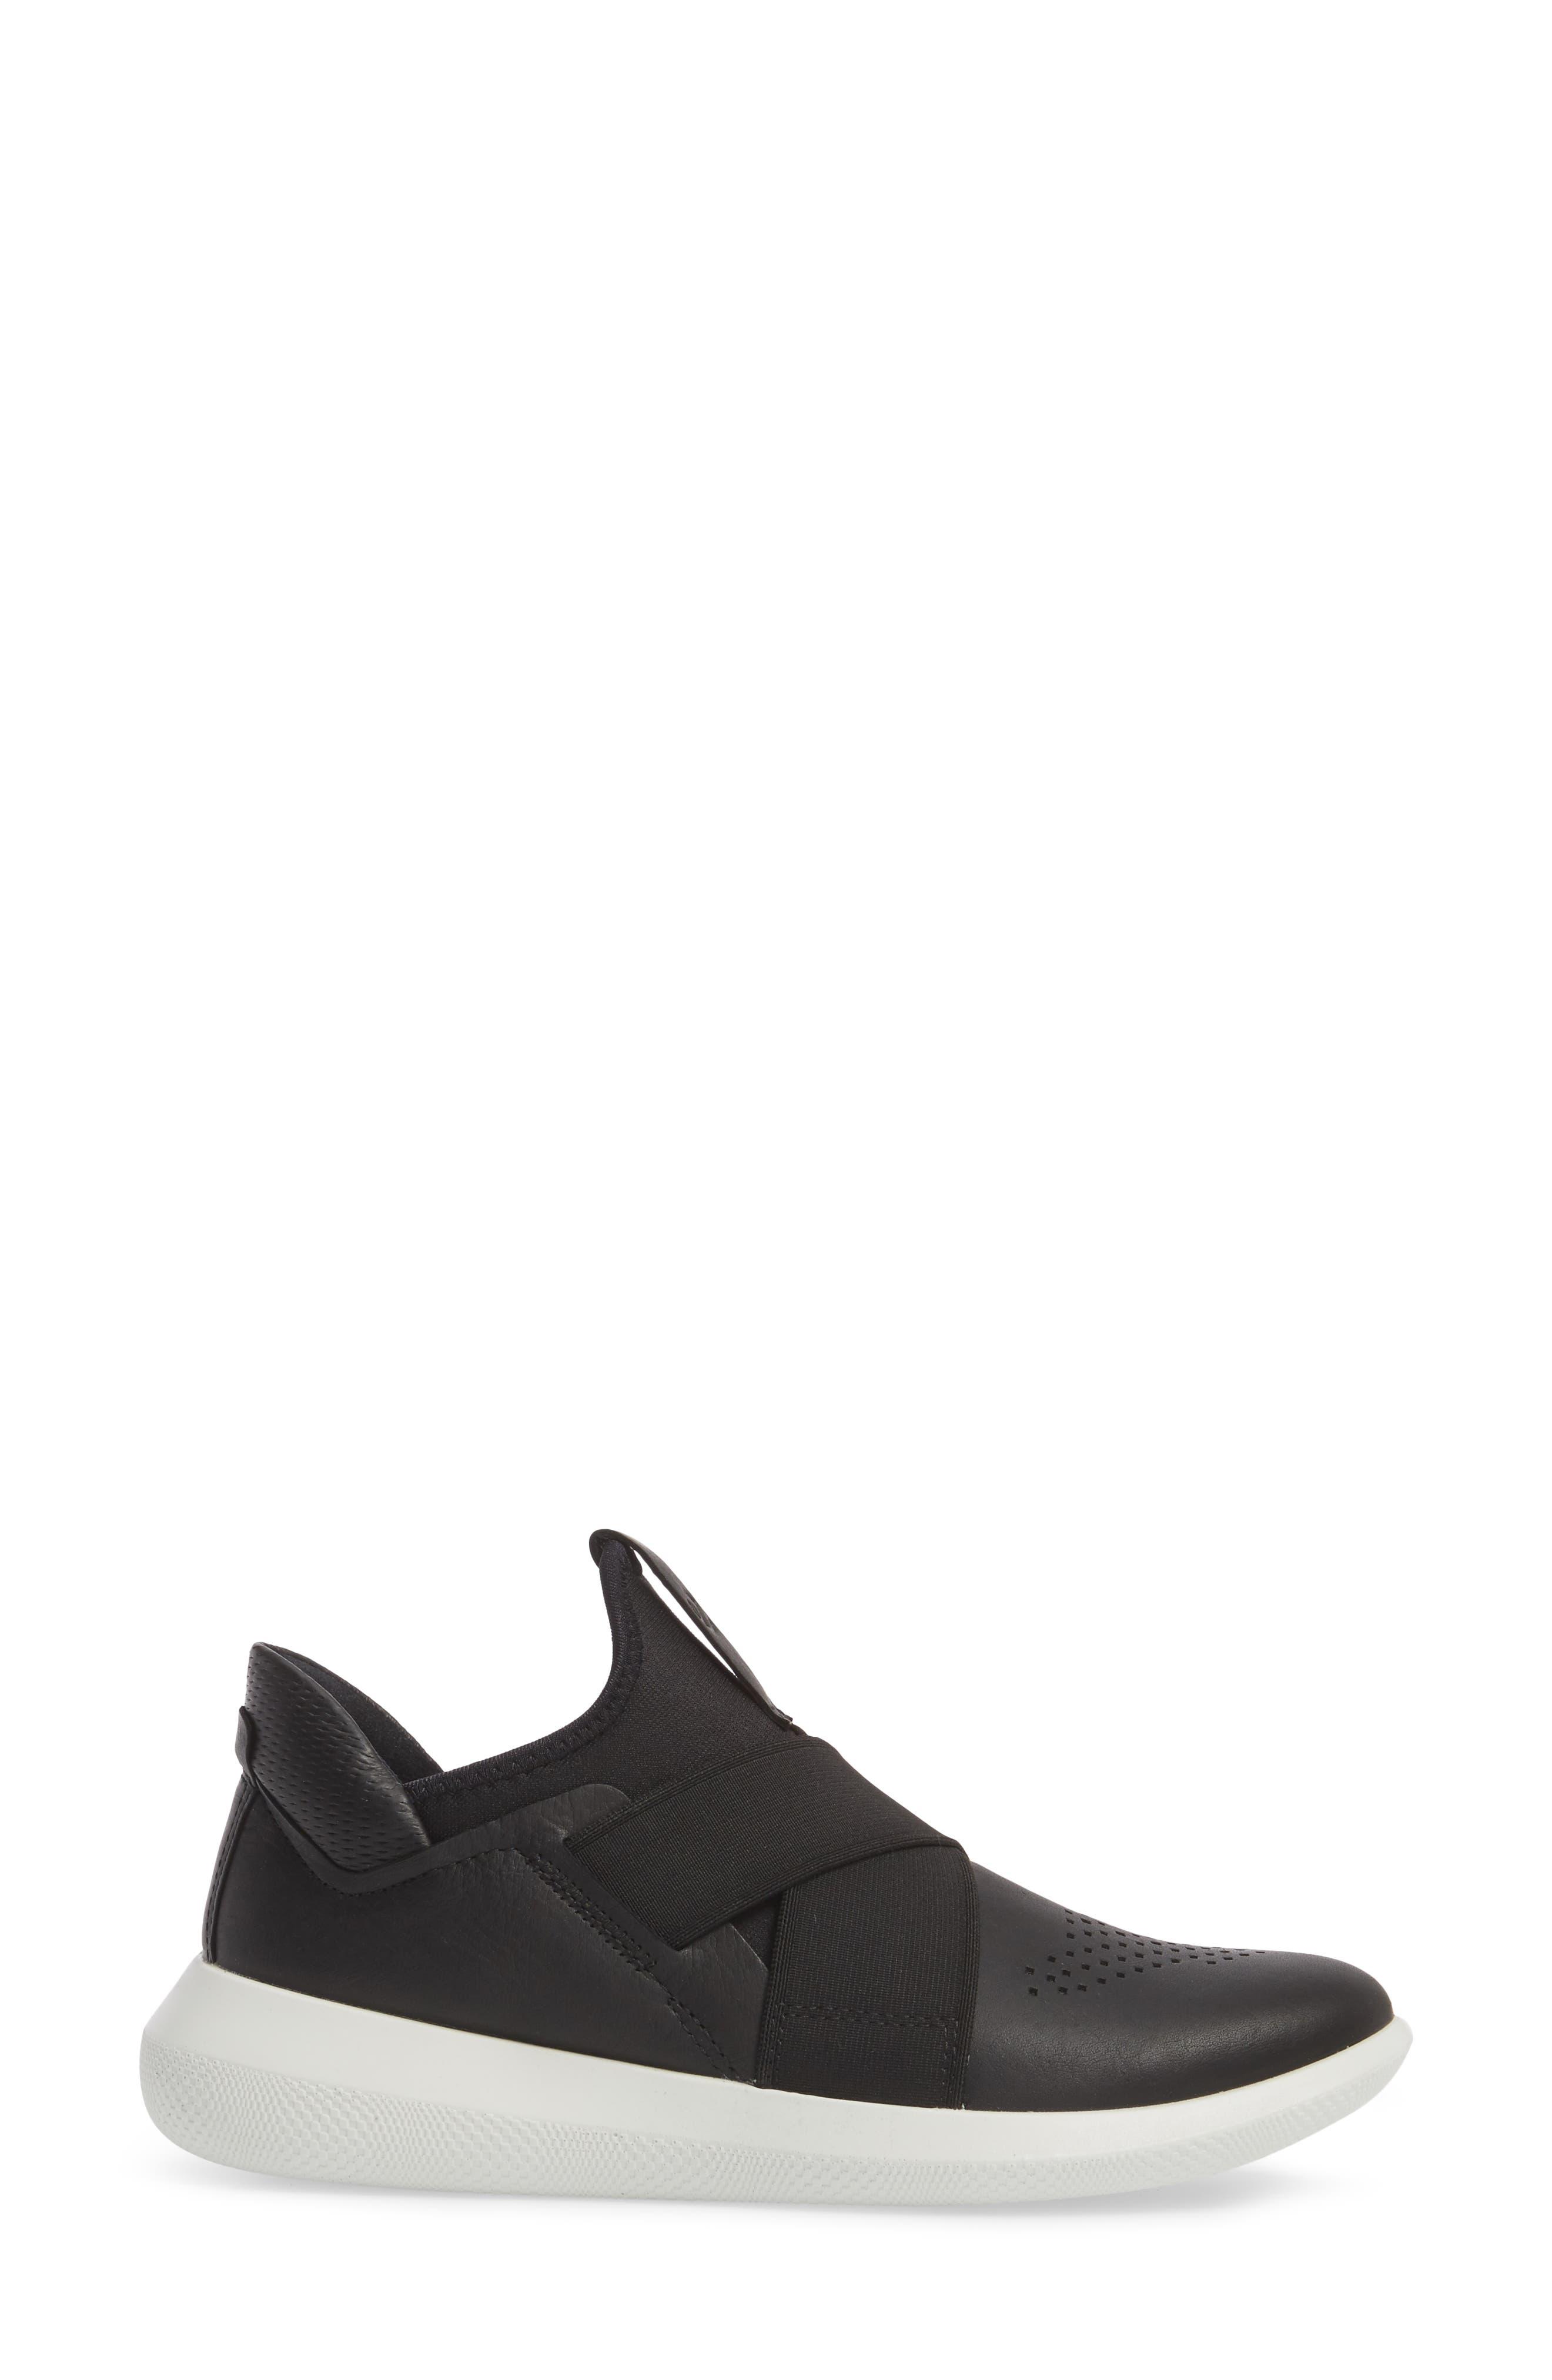 Scinapse Band Sneaker,                             Alternate thumbnail 3, color,                             Black